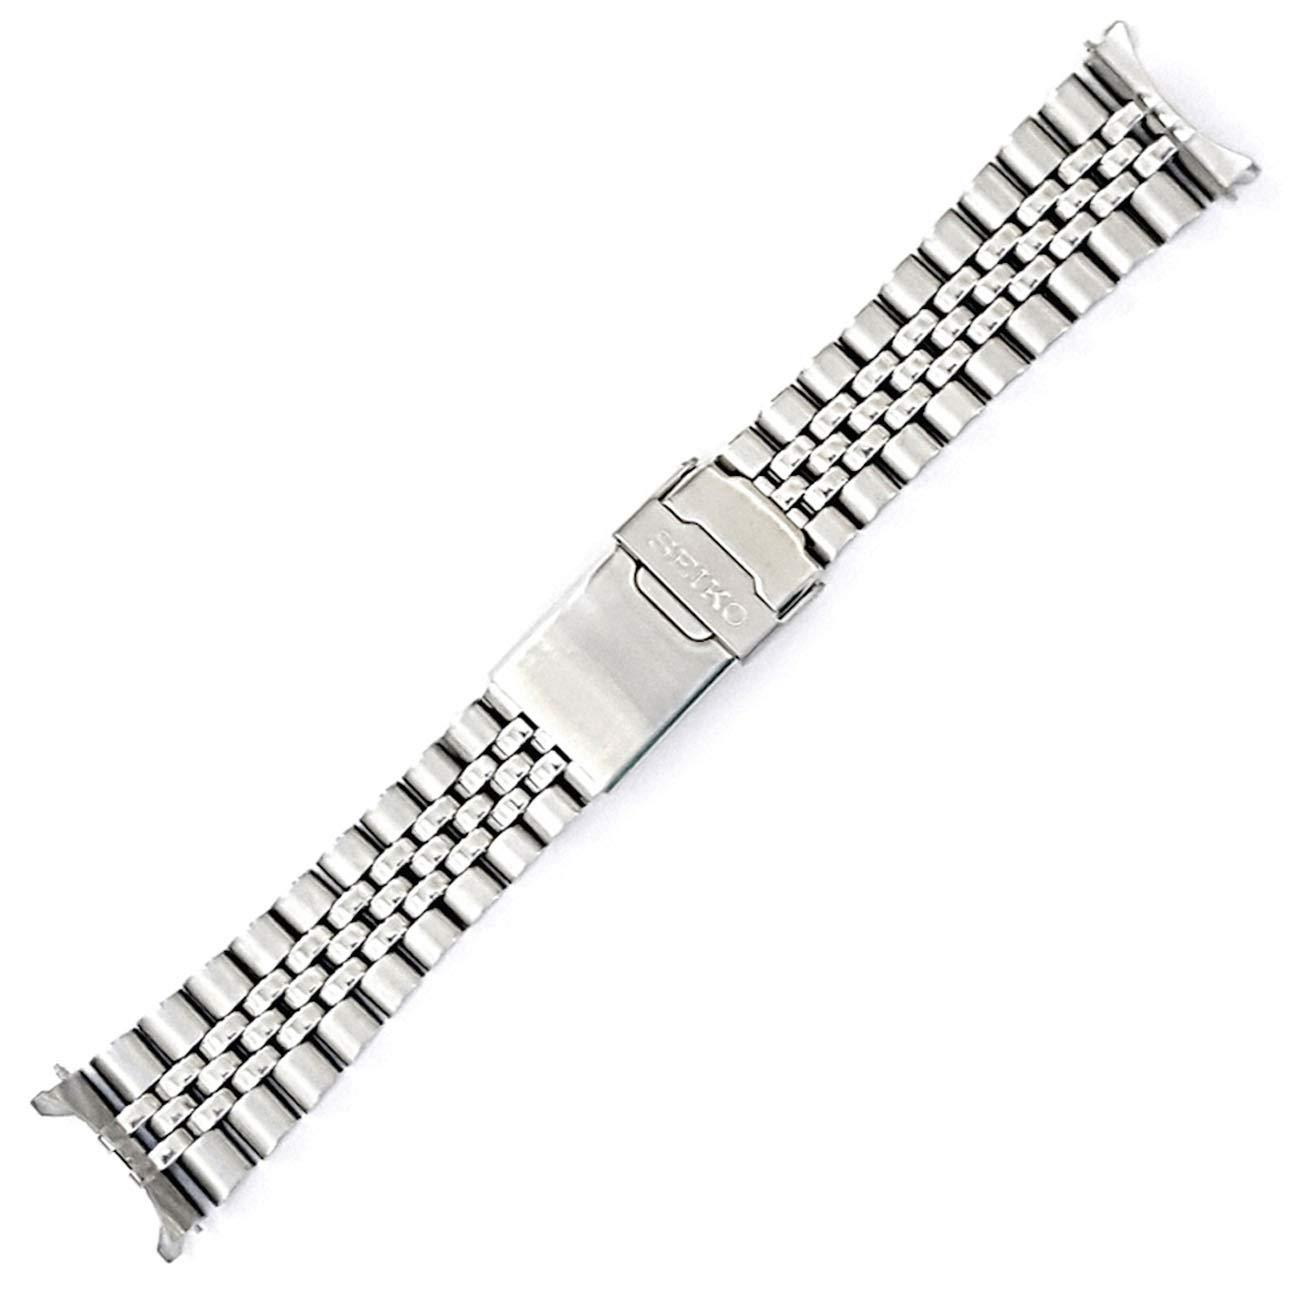 22mm Jubilee Watch Band - Stainless Steel- for Models Diver SKX007, SKX009, SKX171, SKX173, SKX175, SKX175 Cal.7S26